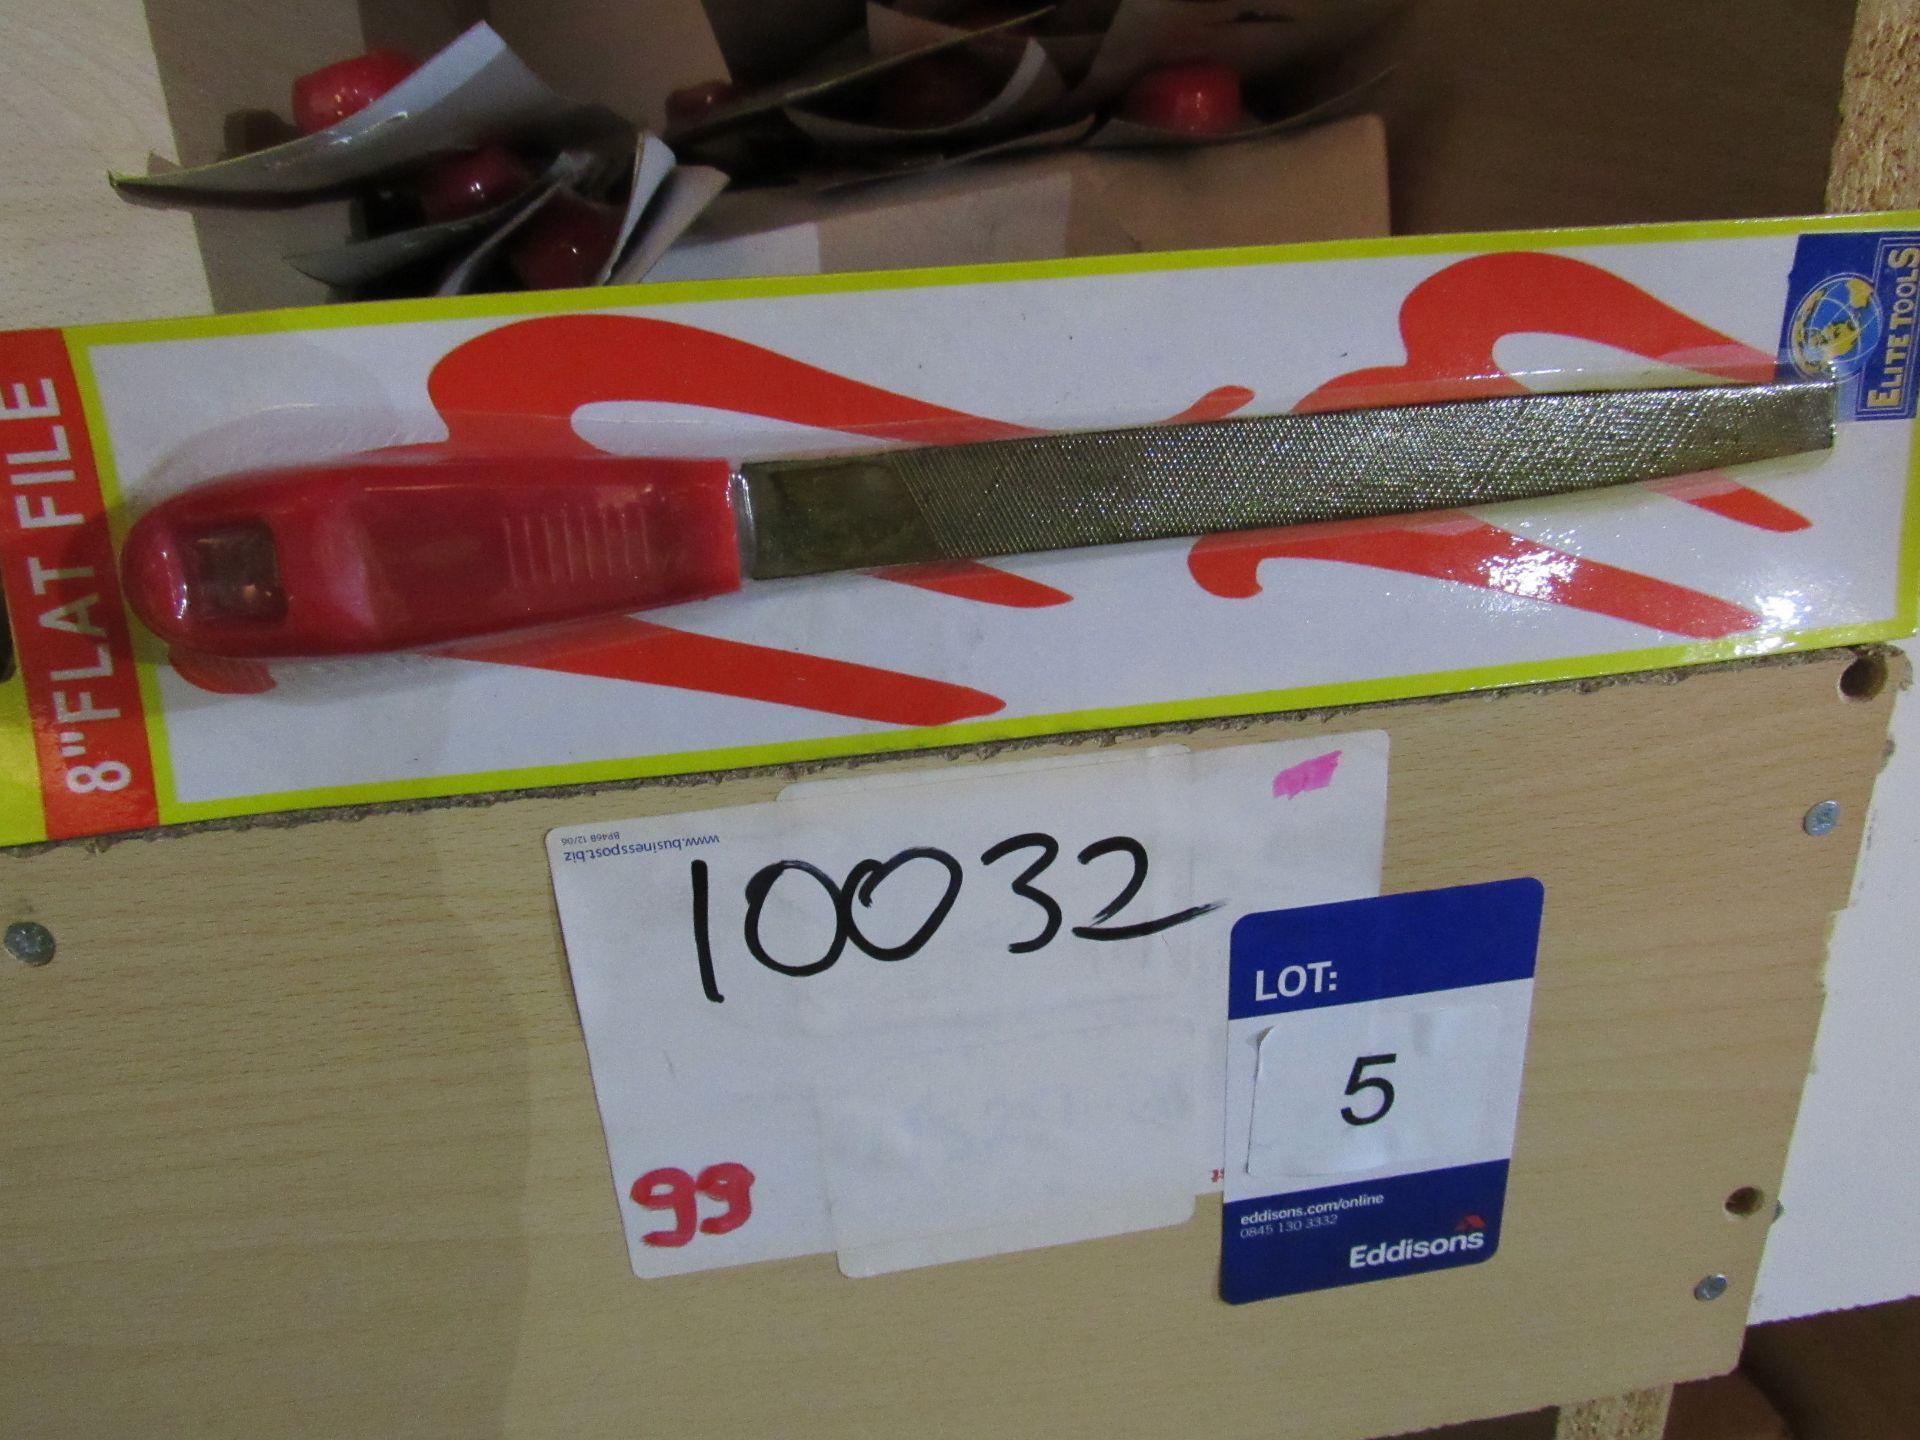 "Lot 5 - 99 10032 8 FLAT FILE - For Metal"""